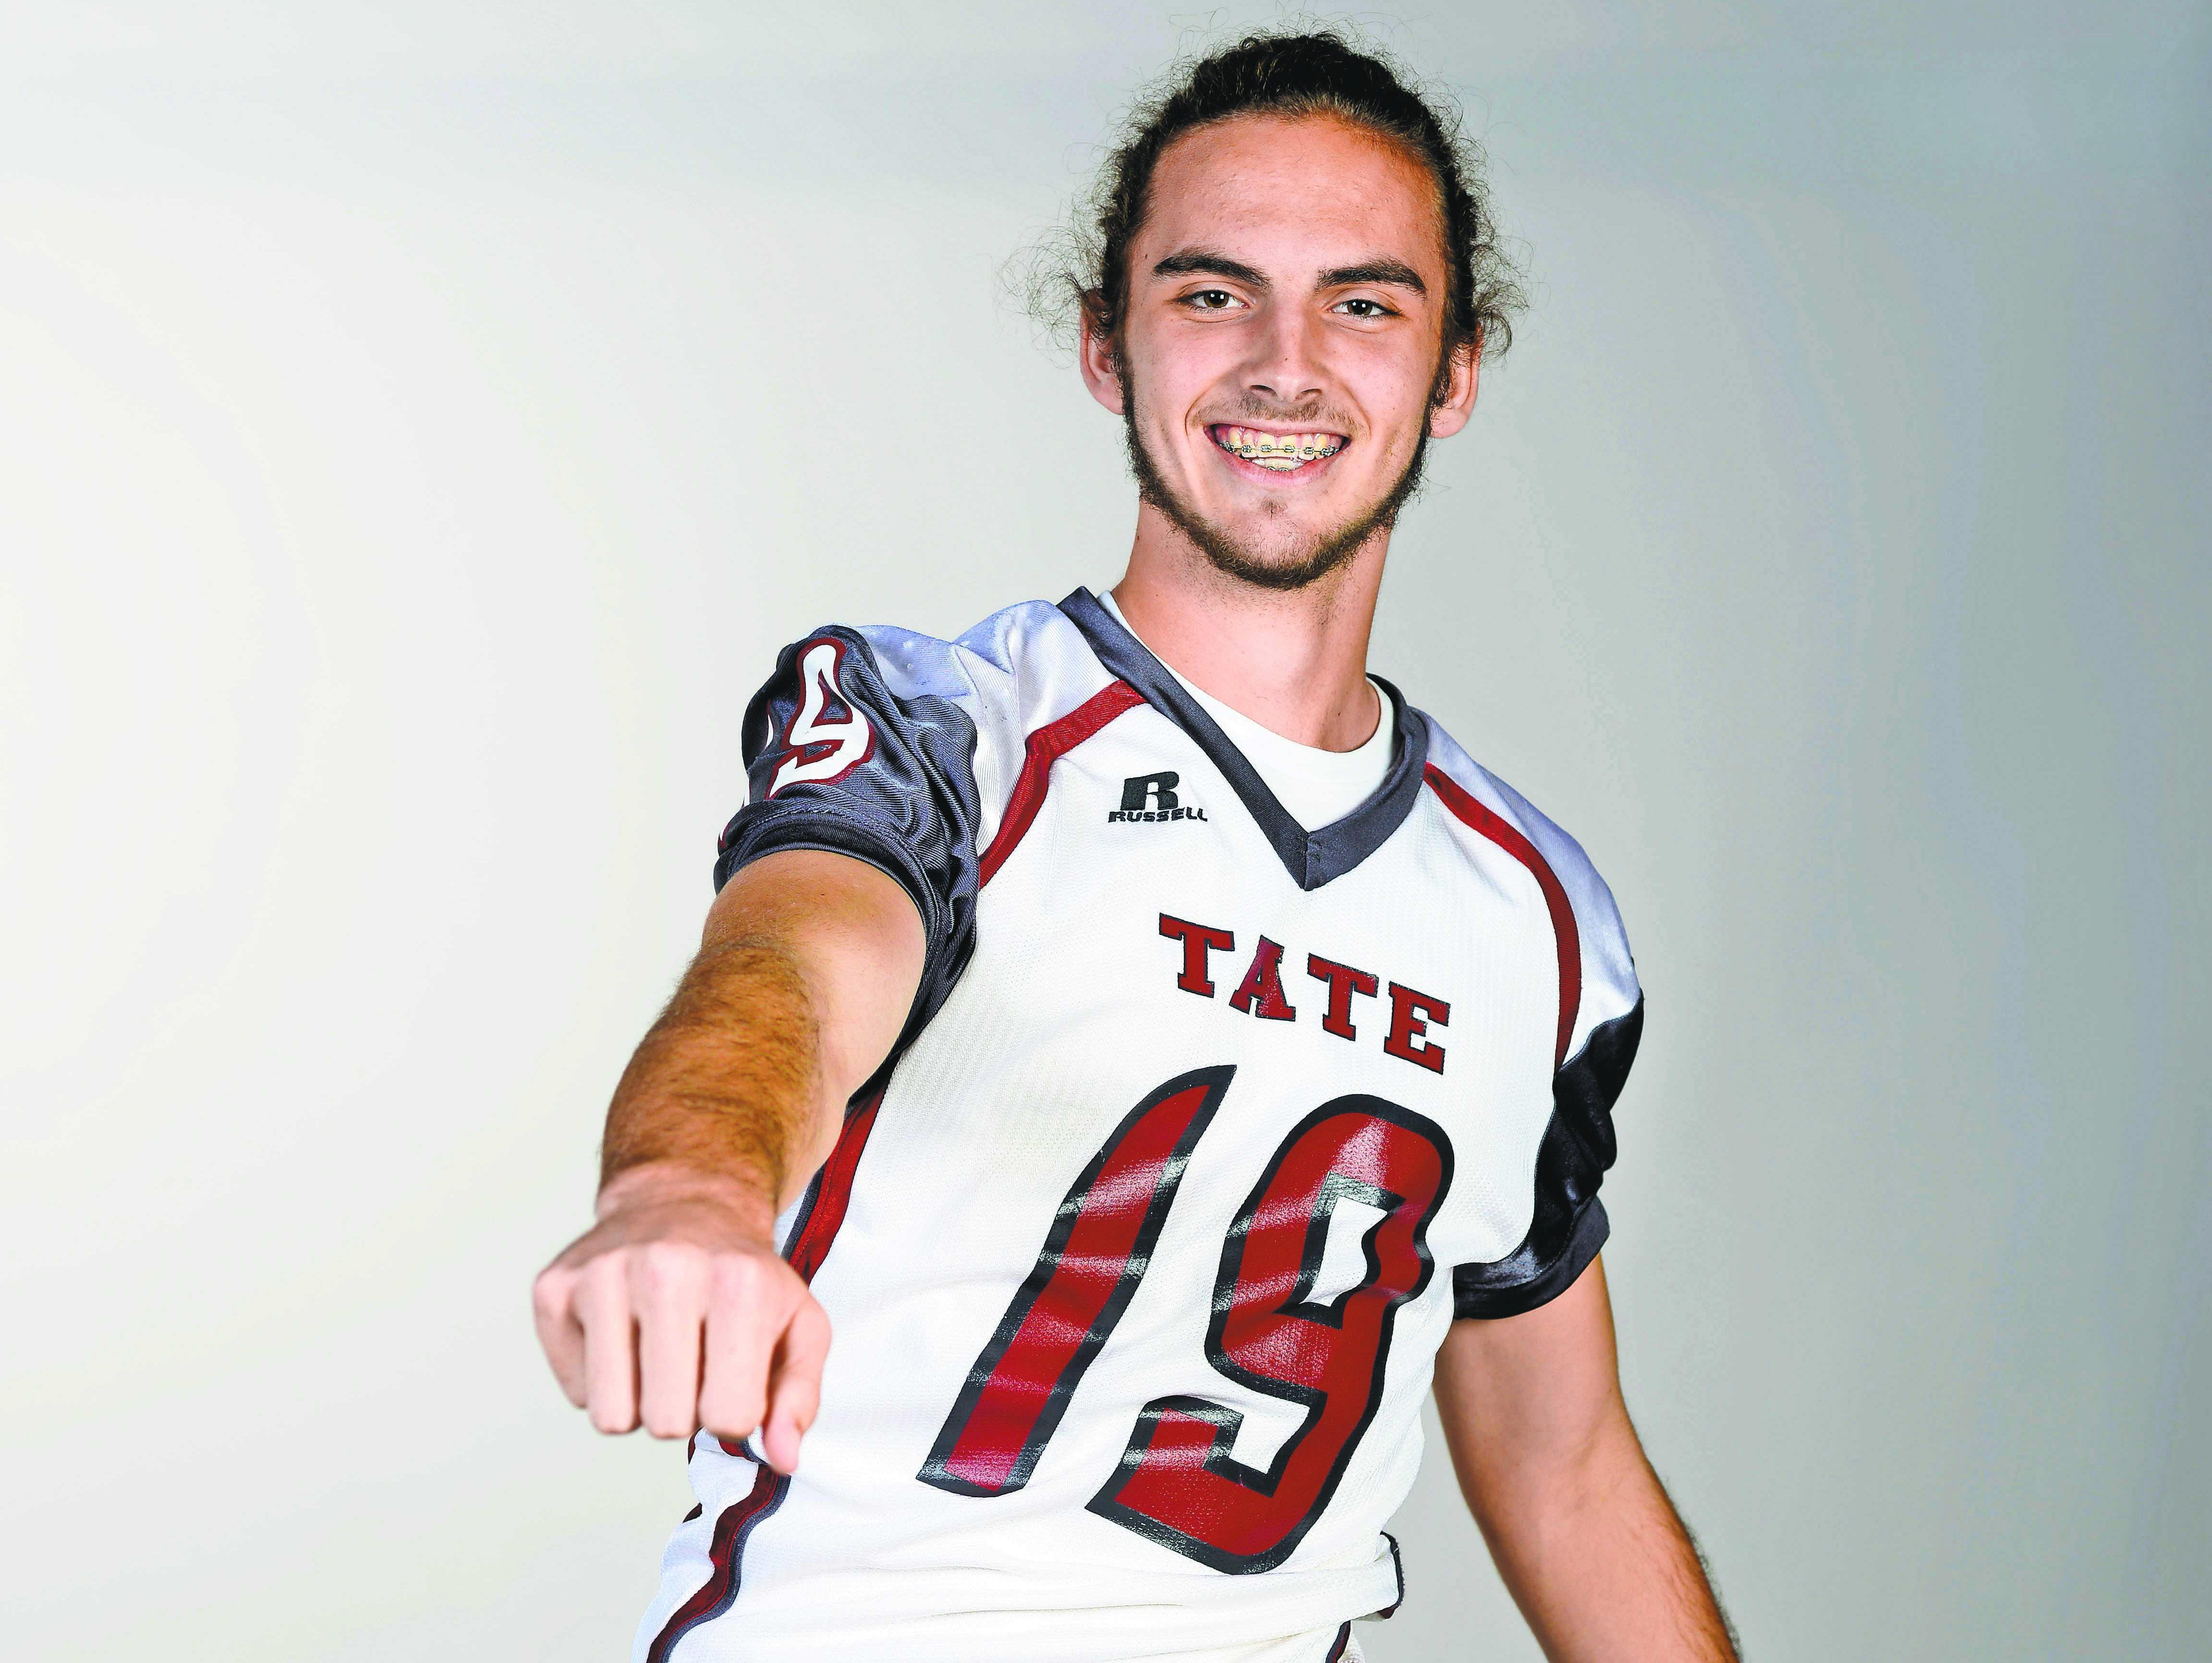 Evan Legassey, Tate High School